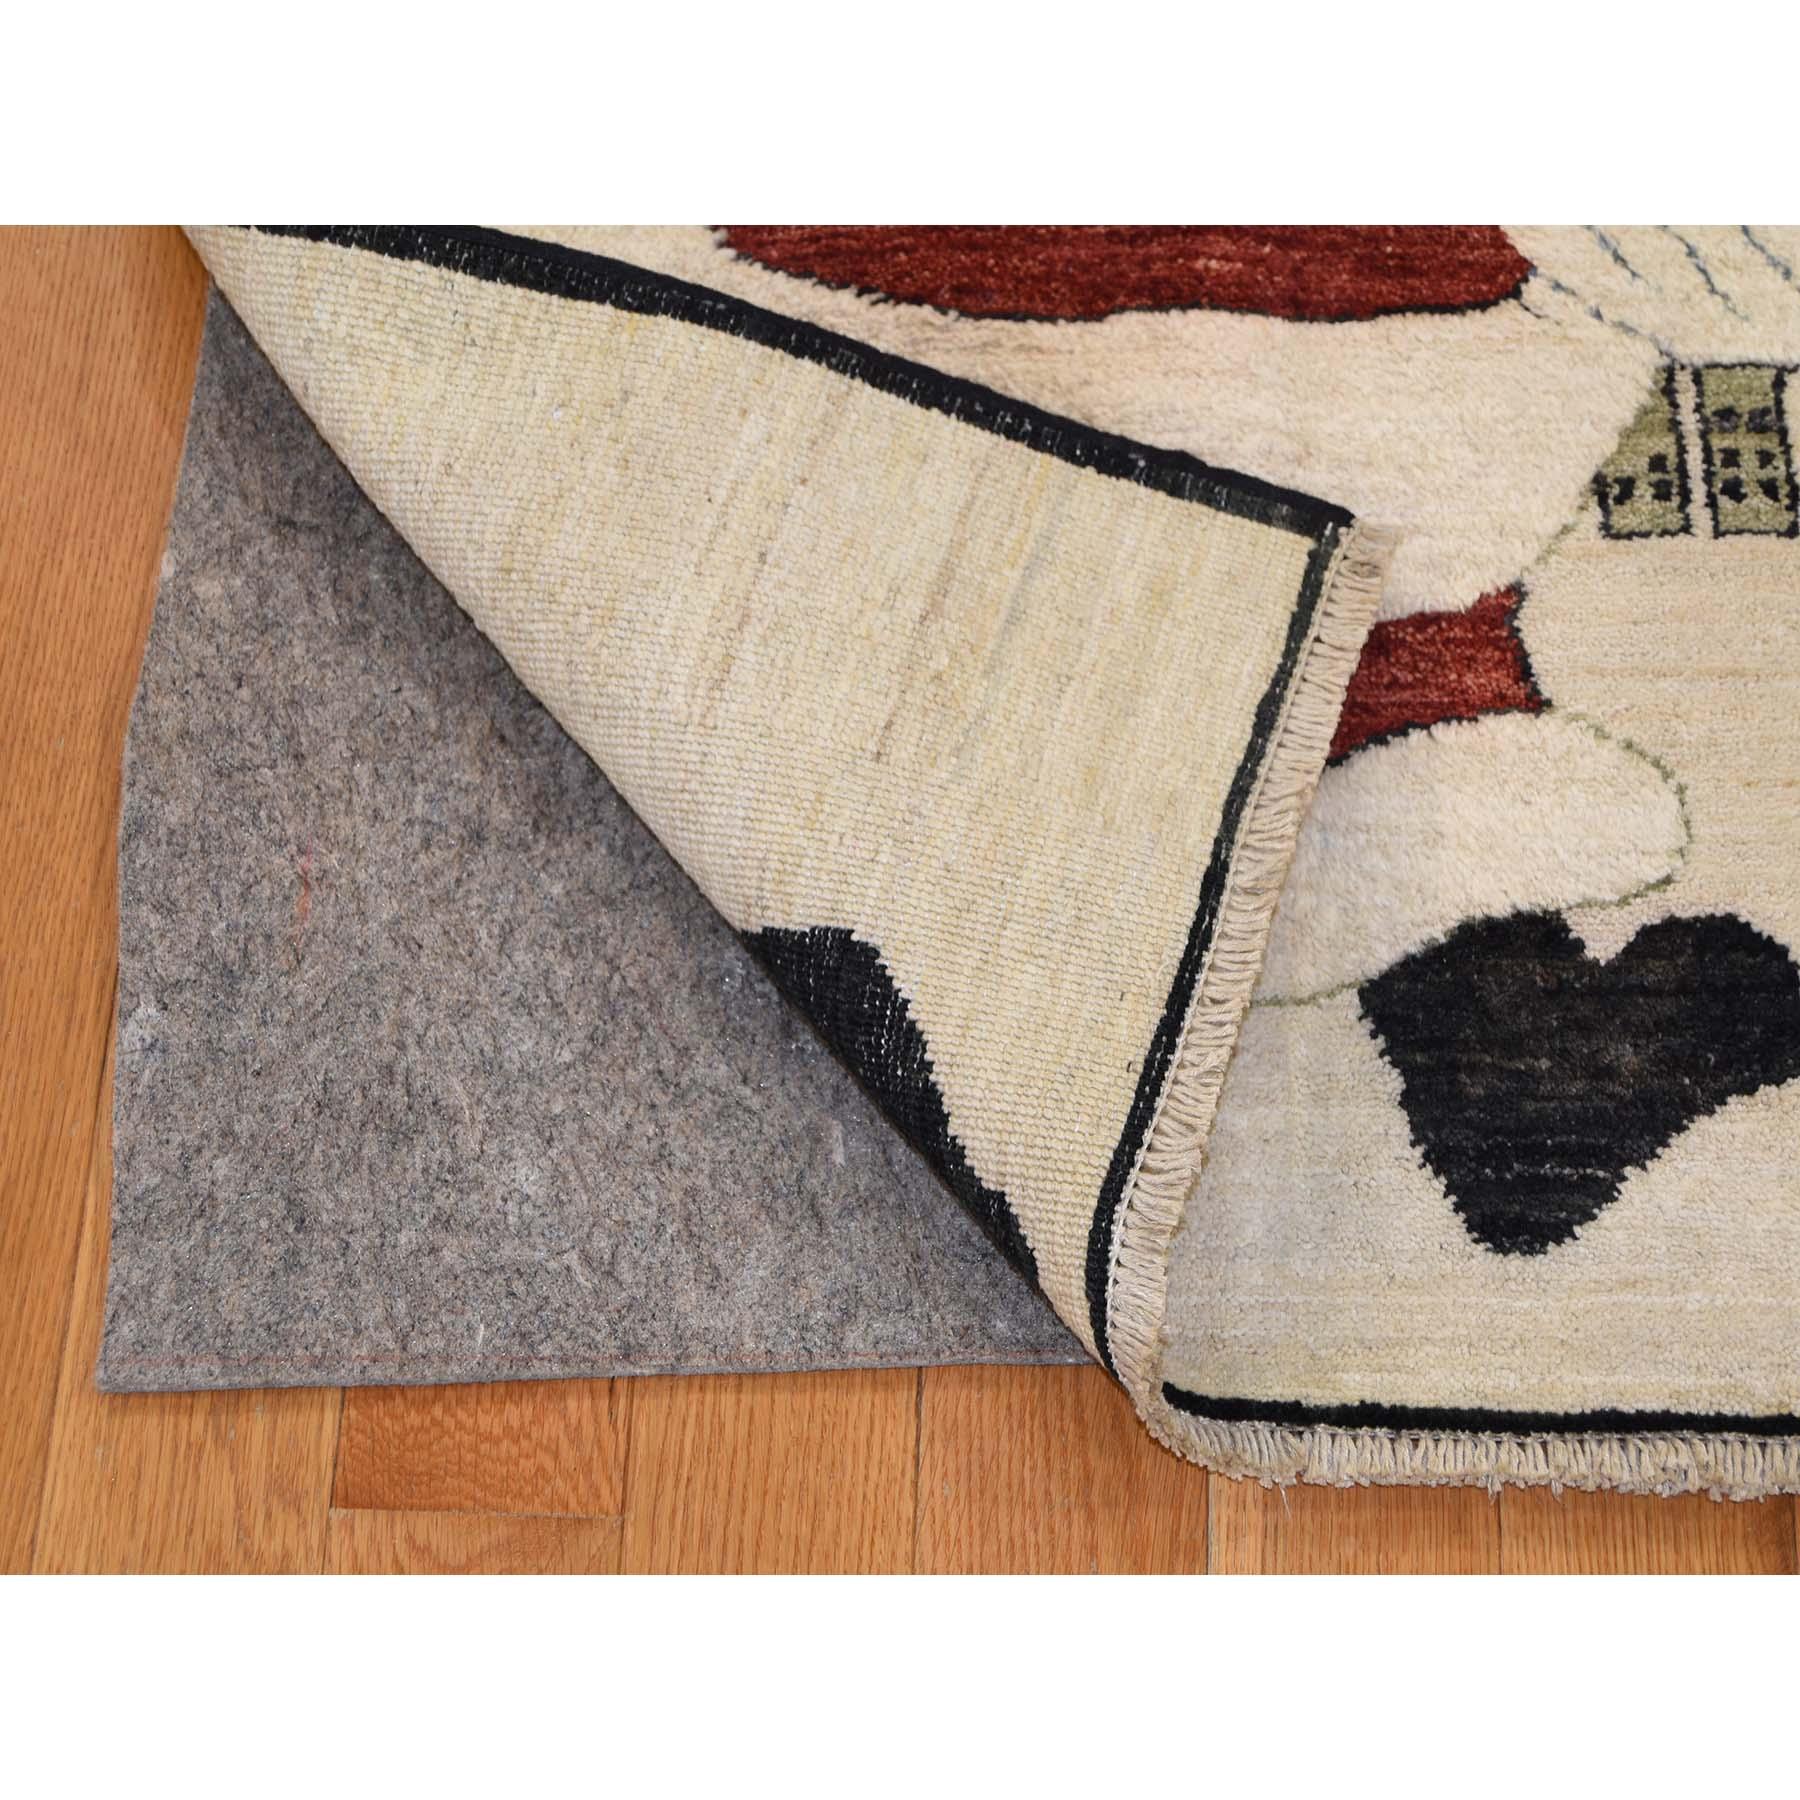 2'3''x3'10'' Hand-Knotted Pure Wool Fluffy Beard Santa Claus Peshawar Quality Rug